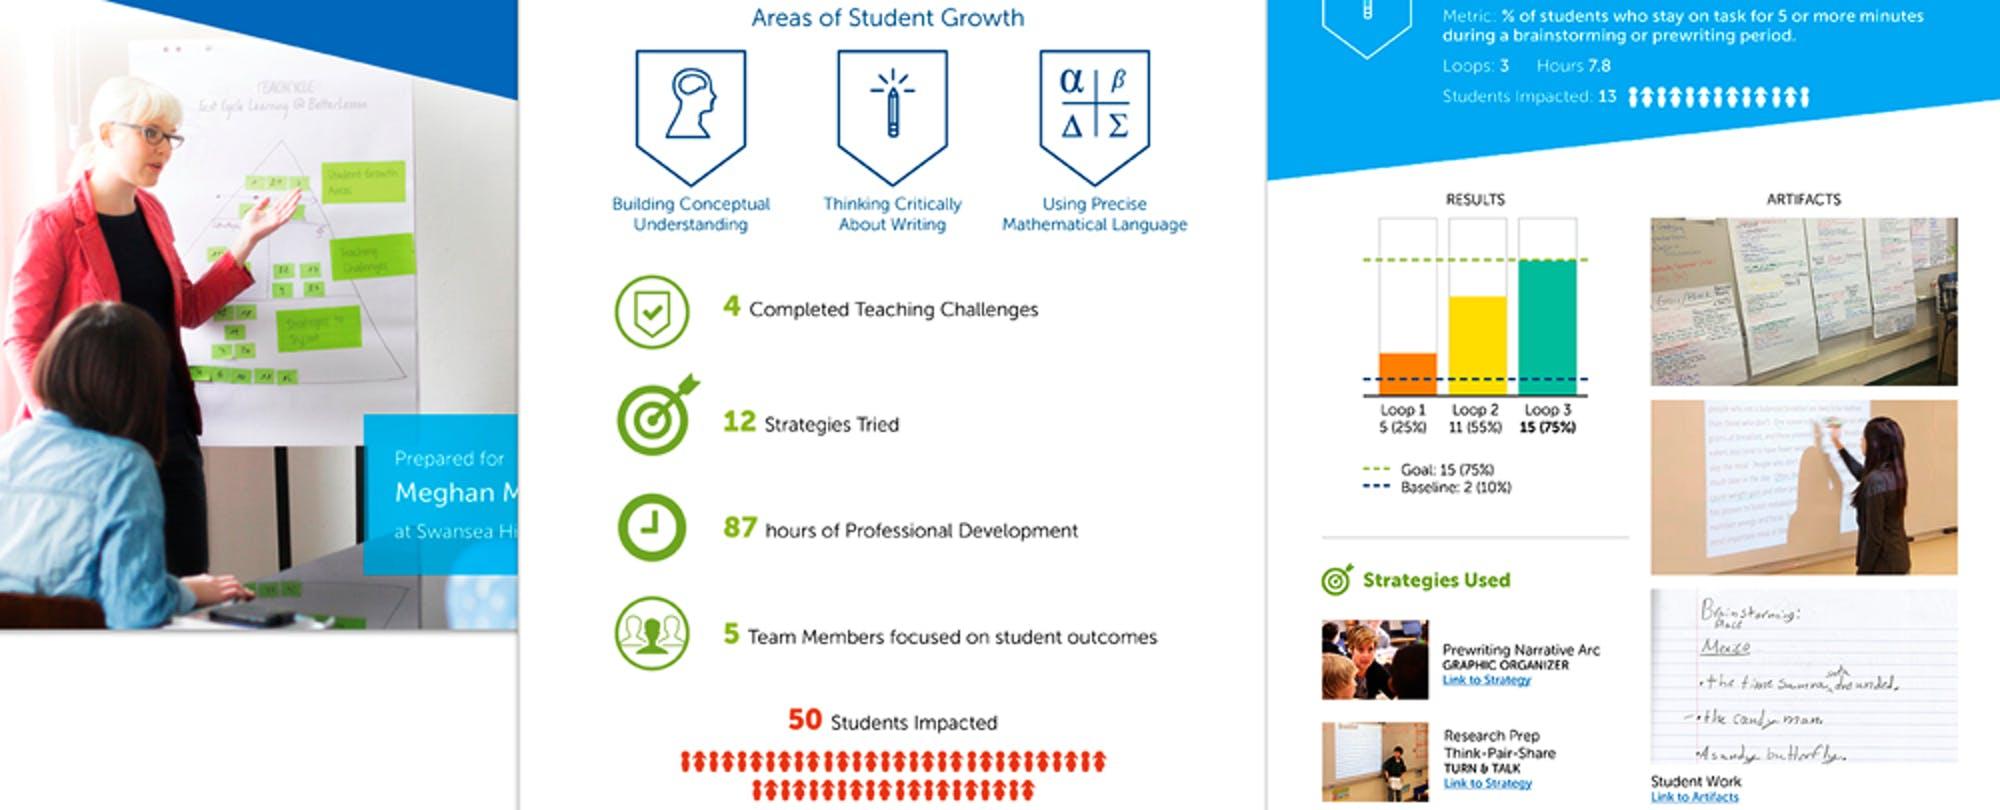 BetterLesson Raises $6 Million to Make Professional Development Personal